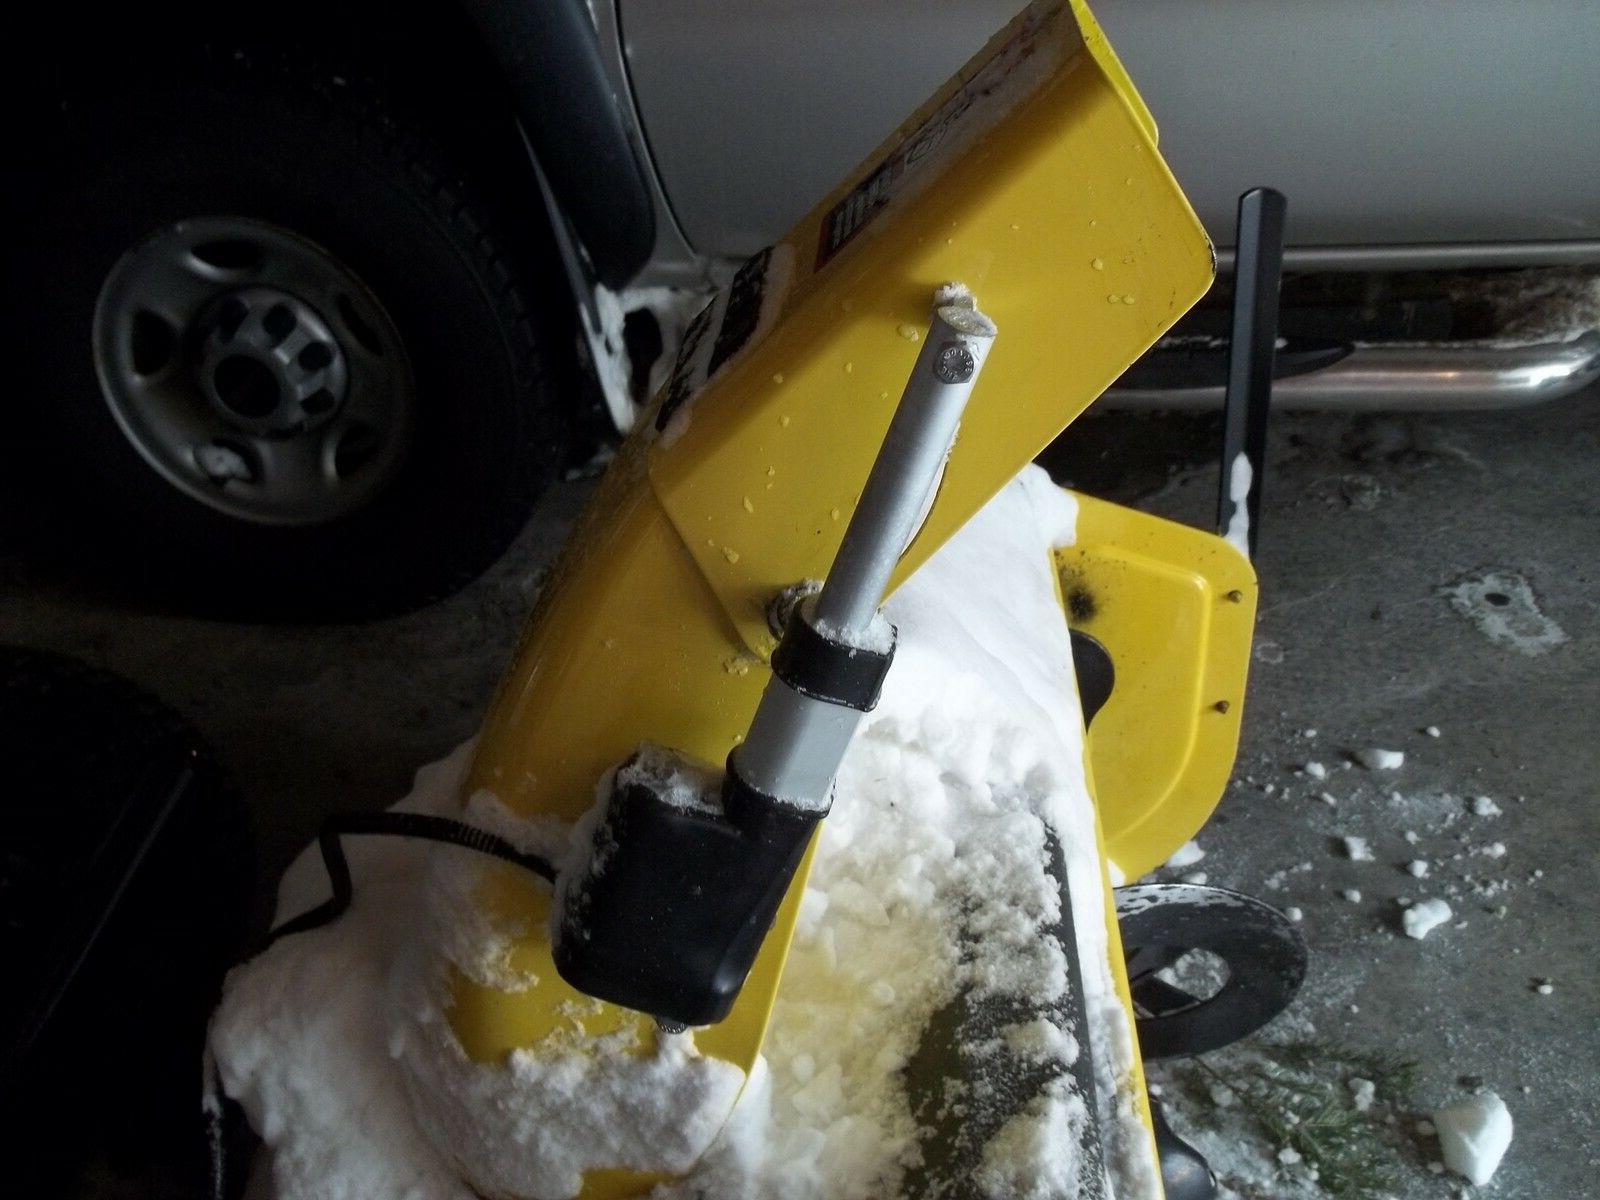 FOR JOHN SNOW BLOWER LINEAR CHUTE CONTROL KIT PLANS